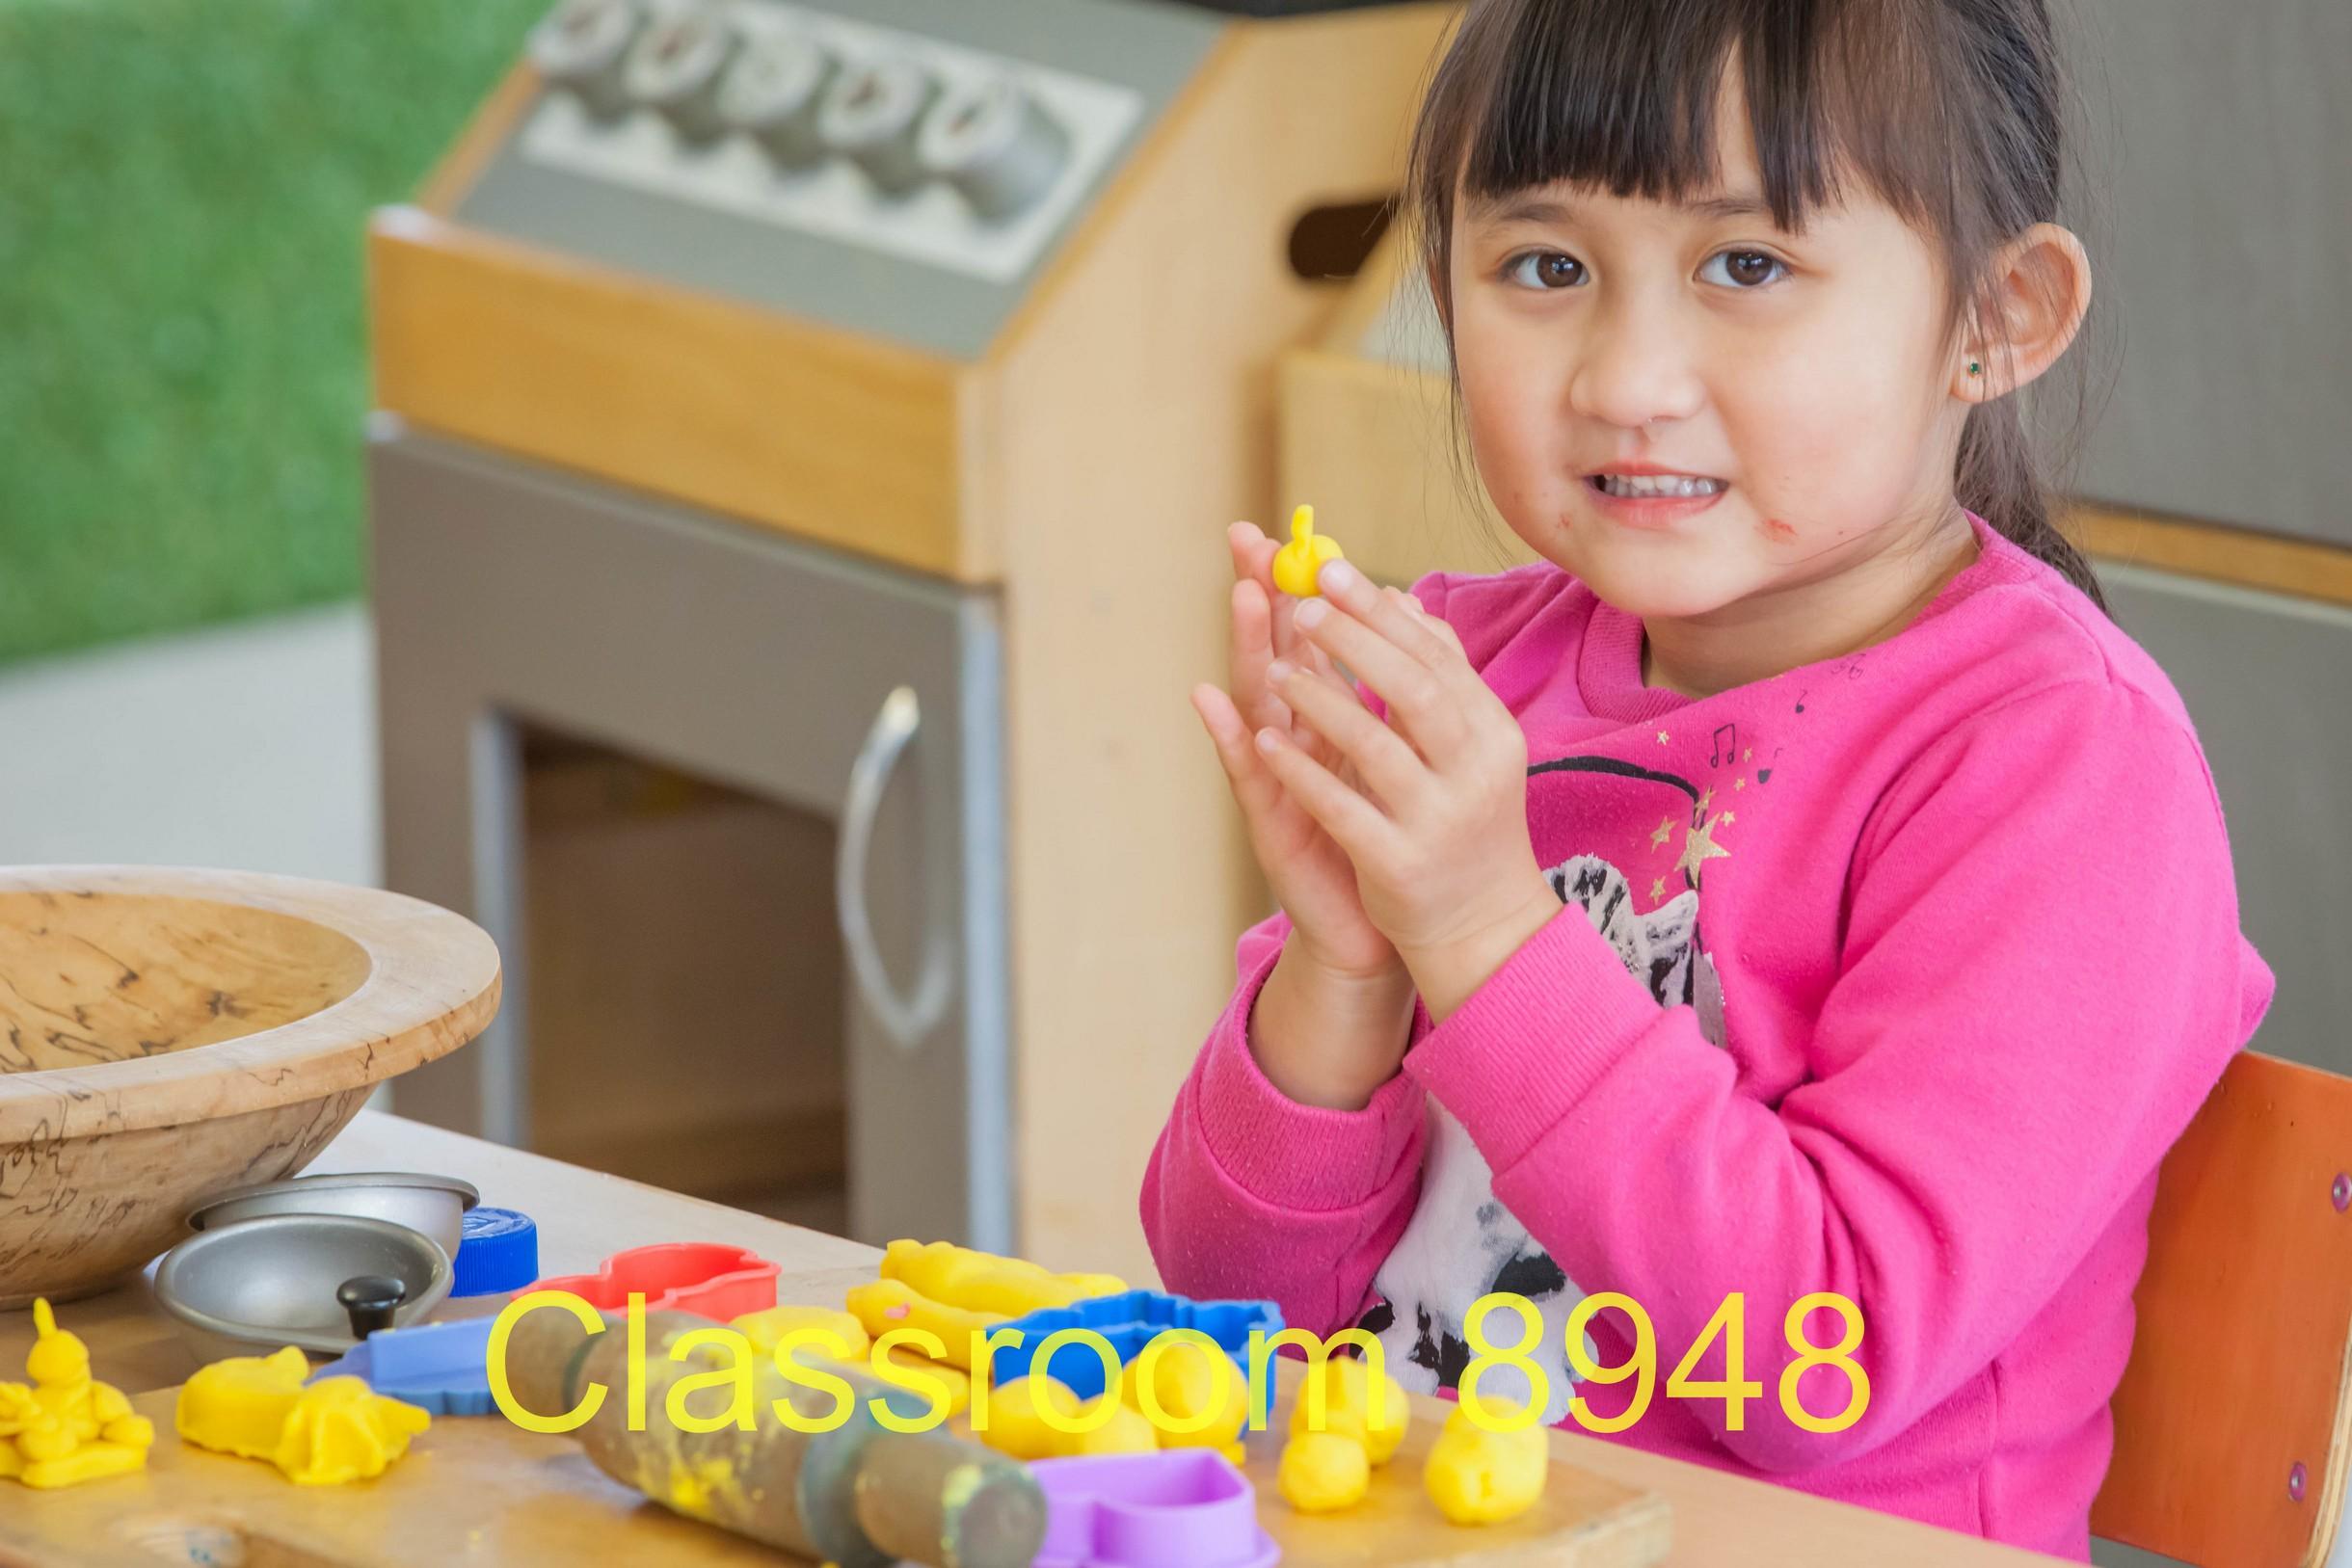 Classroom 8948